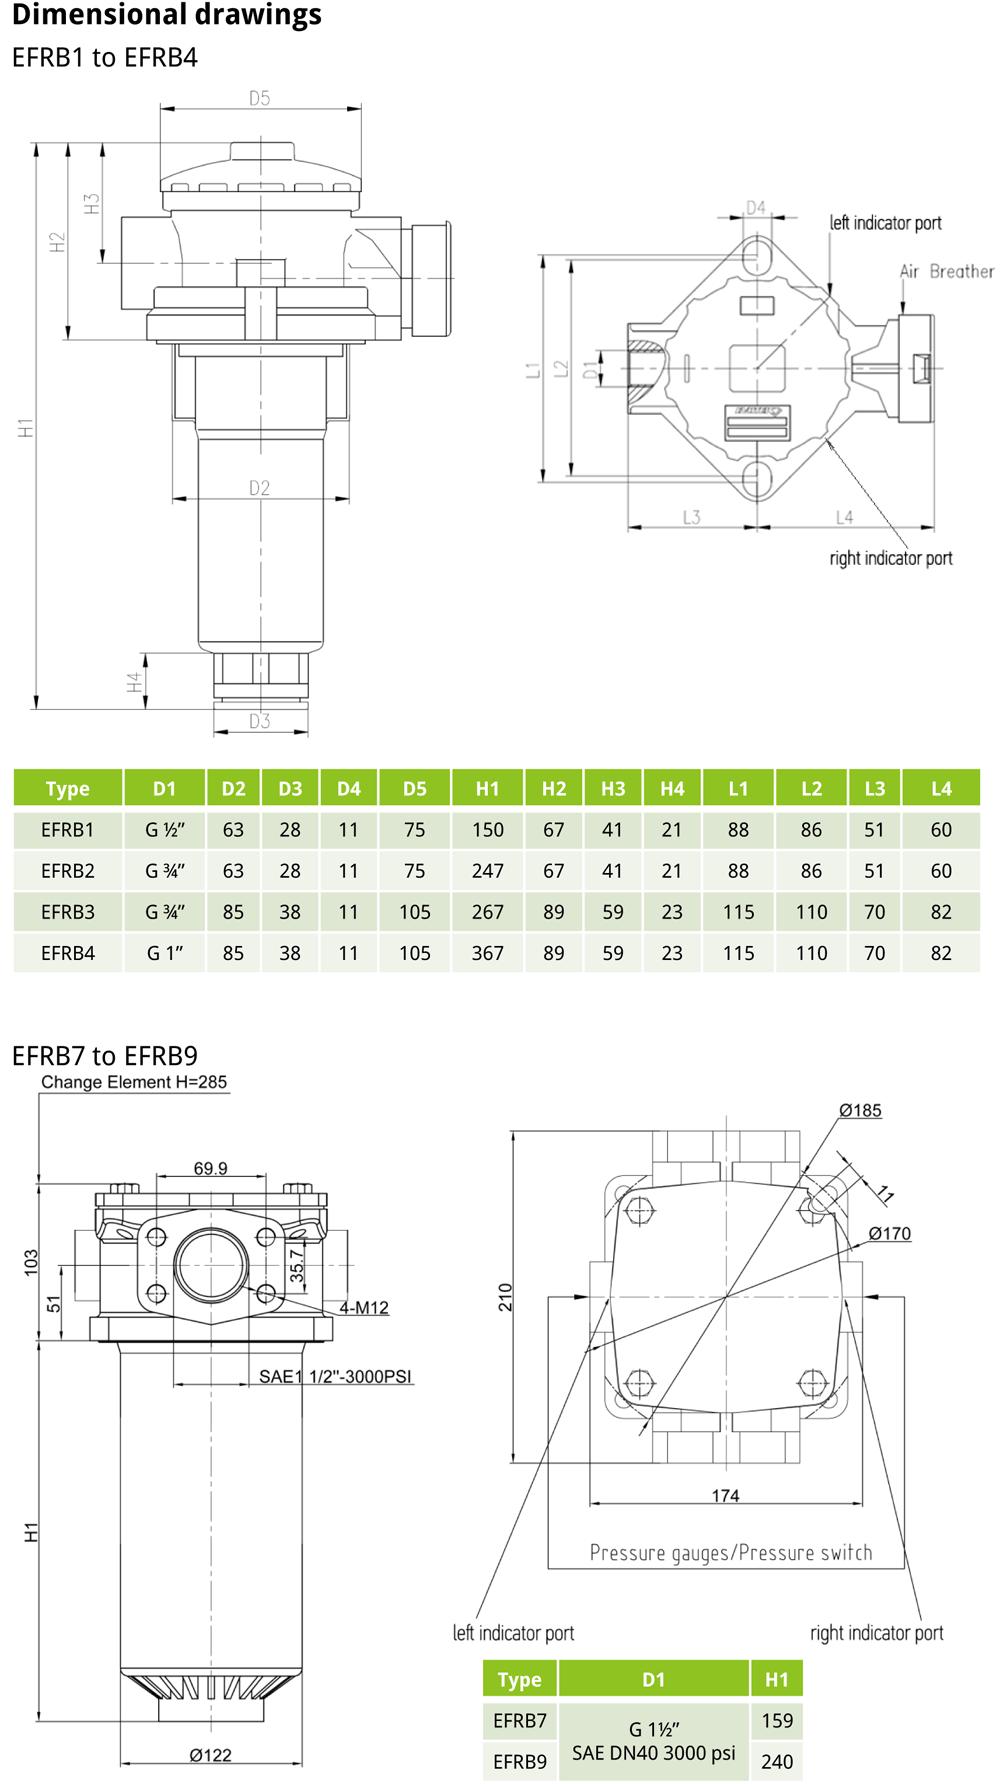 EFRB EVOTEK technical drawings